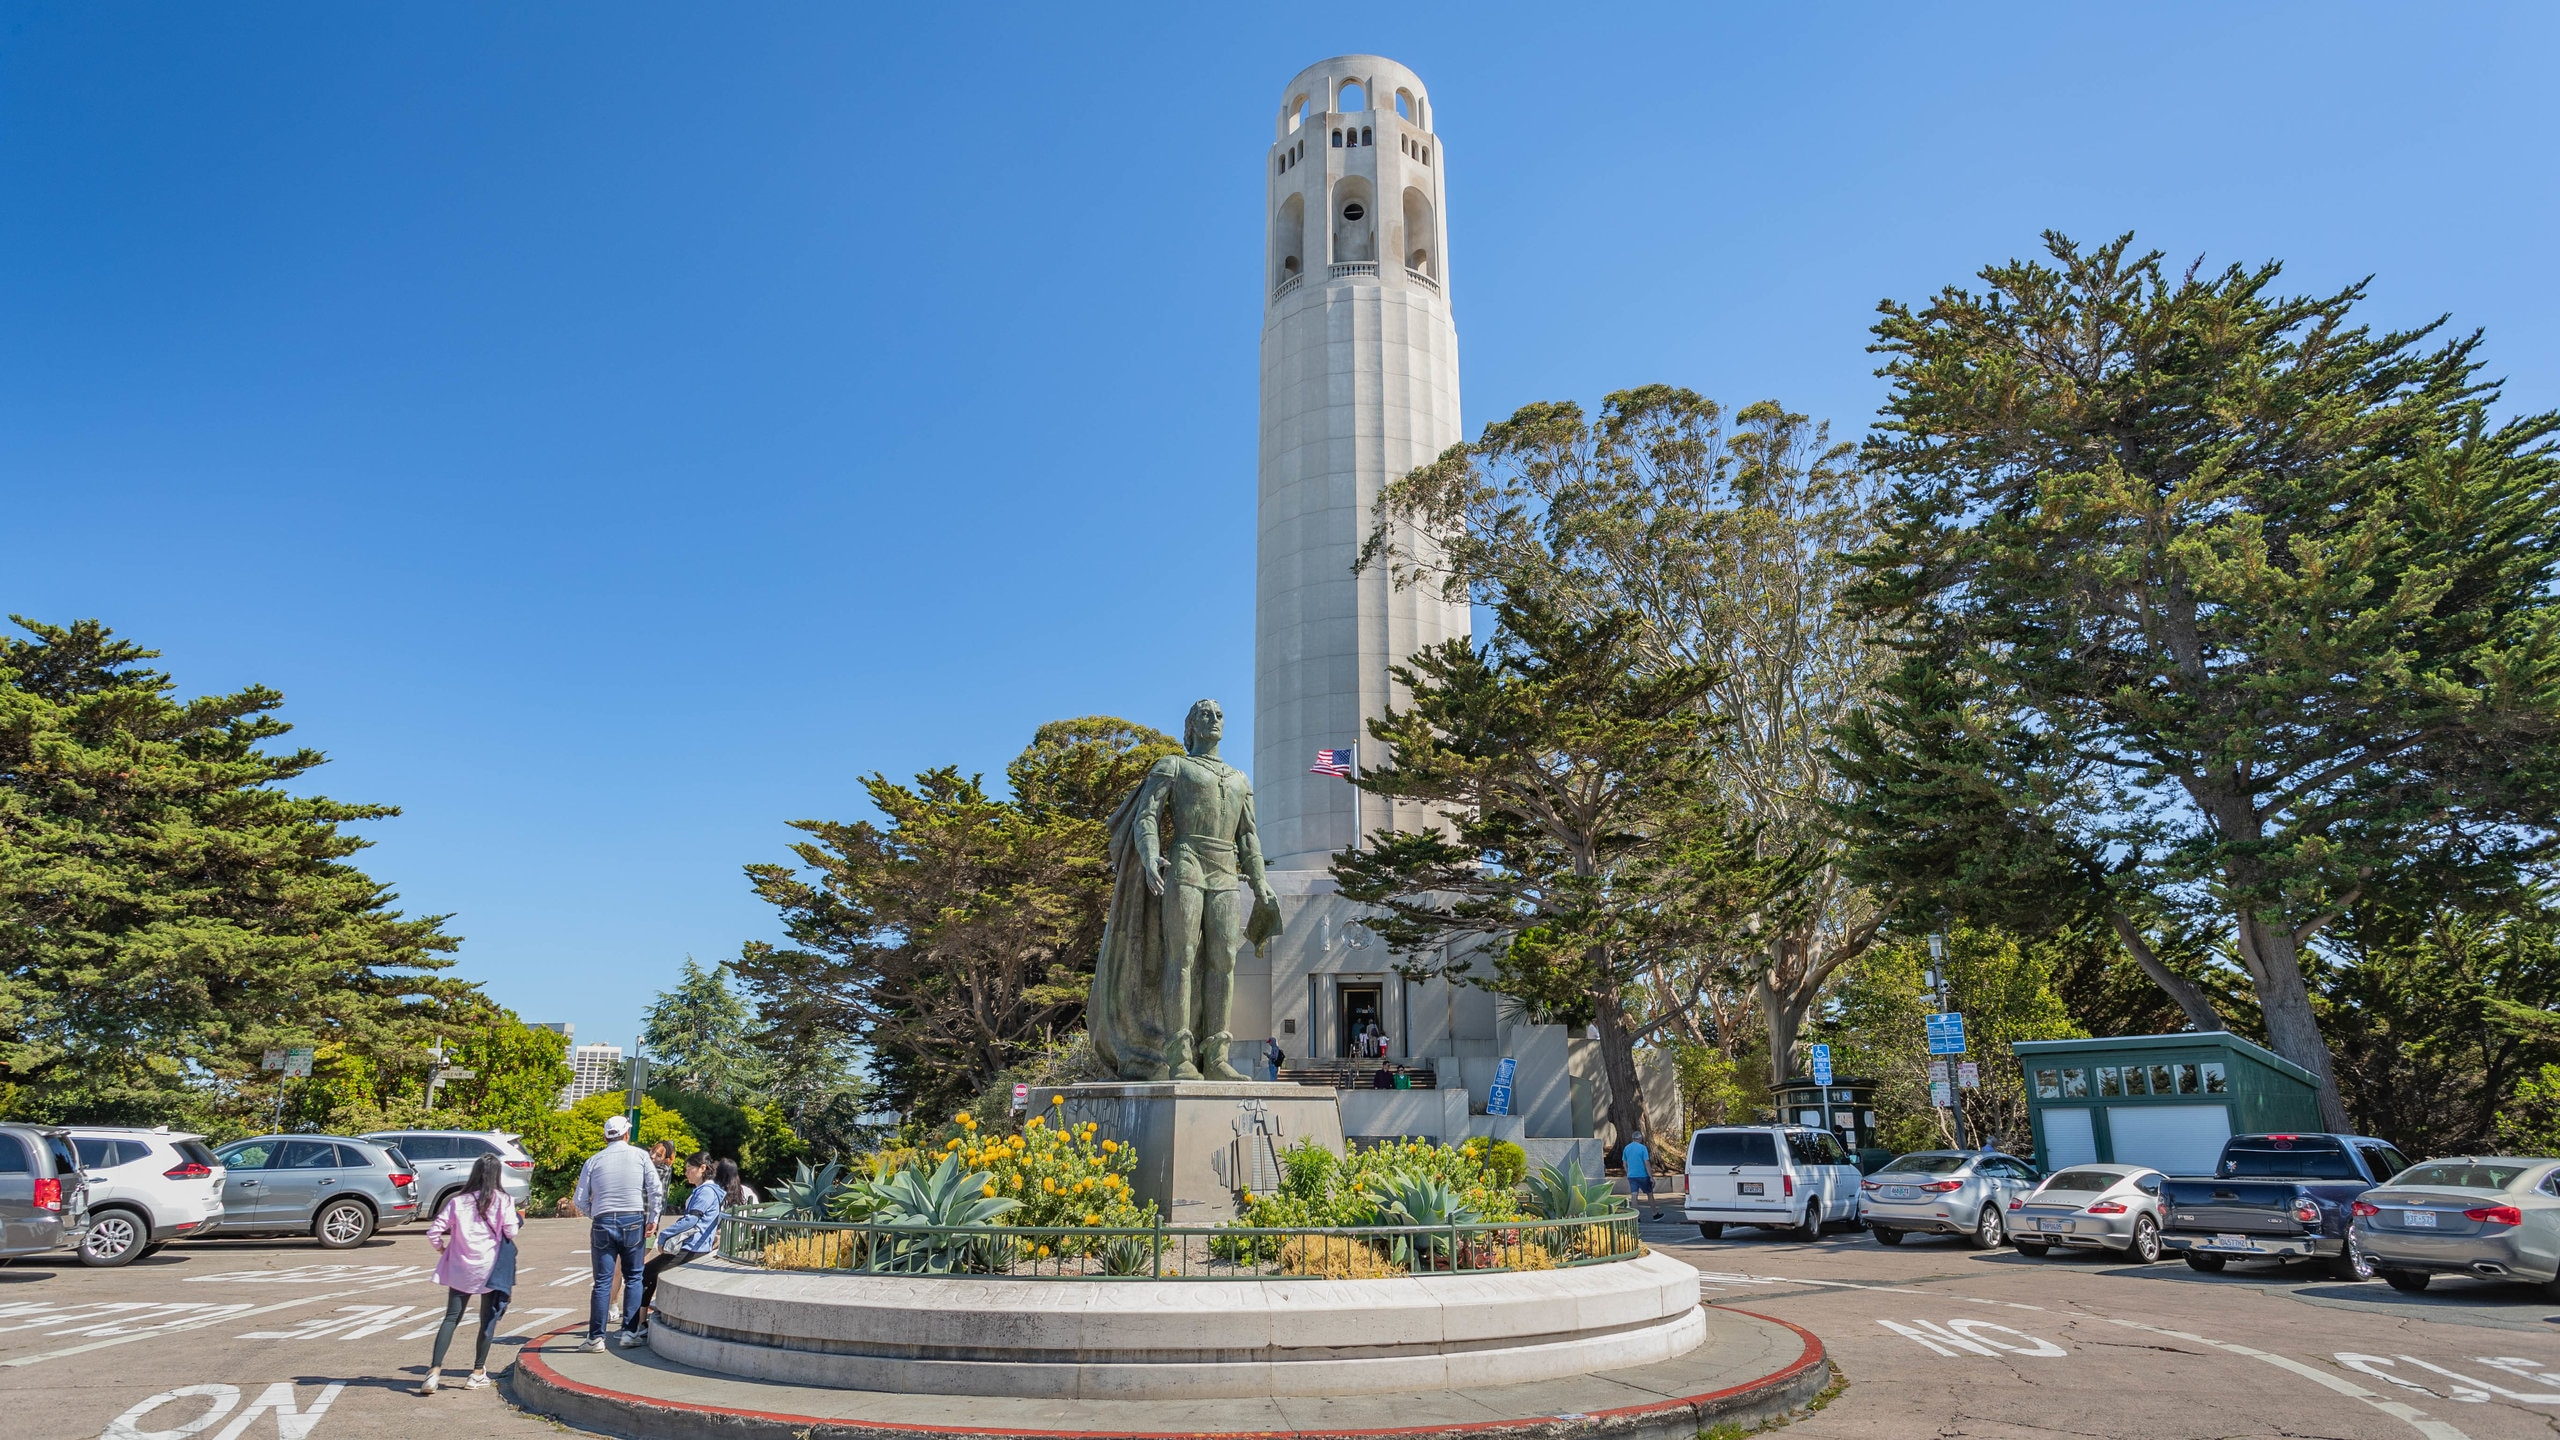 Telegraph Hill, San Francisco, California, United States of America